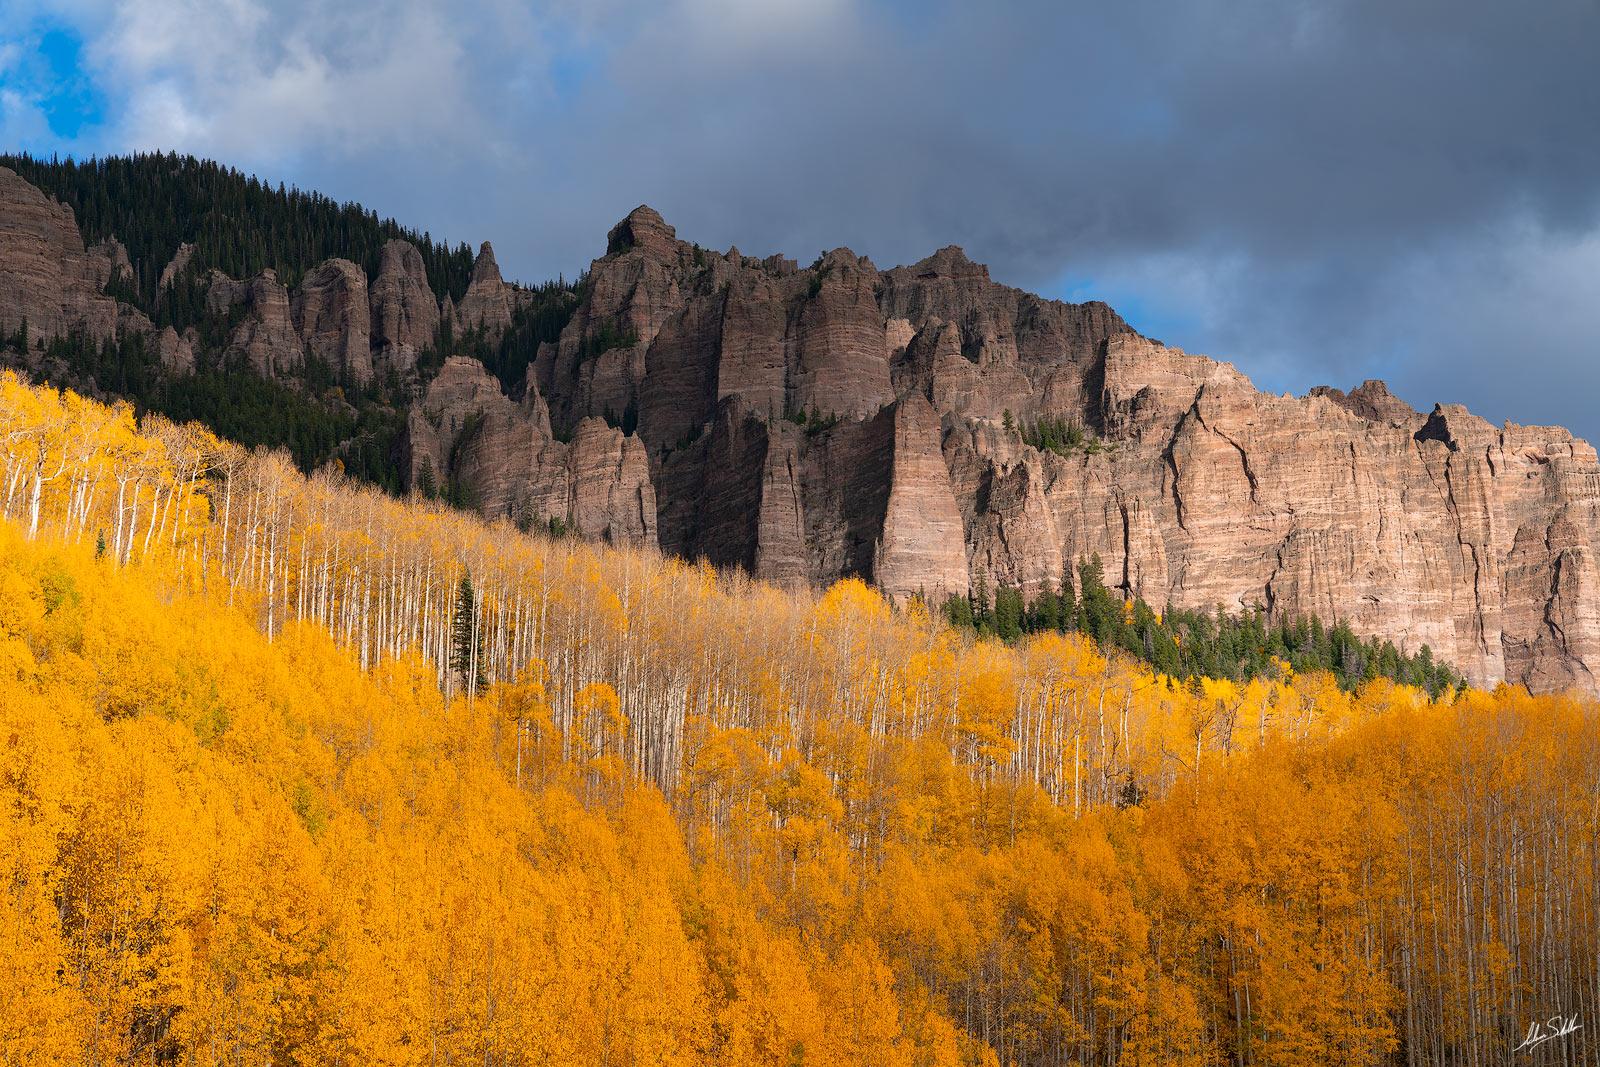 Brilliant fall color below the pinnacles overlooking Silver Jack Reservoir in the San Juan Mountains of Colorado. © Adam Schallau...